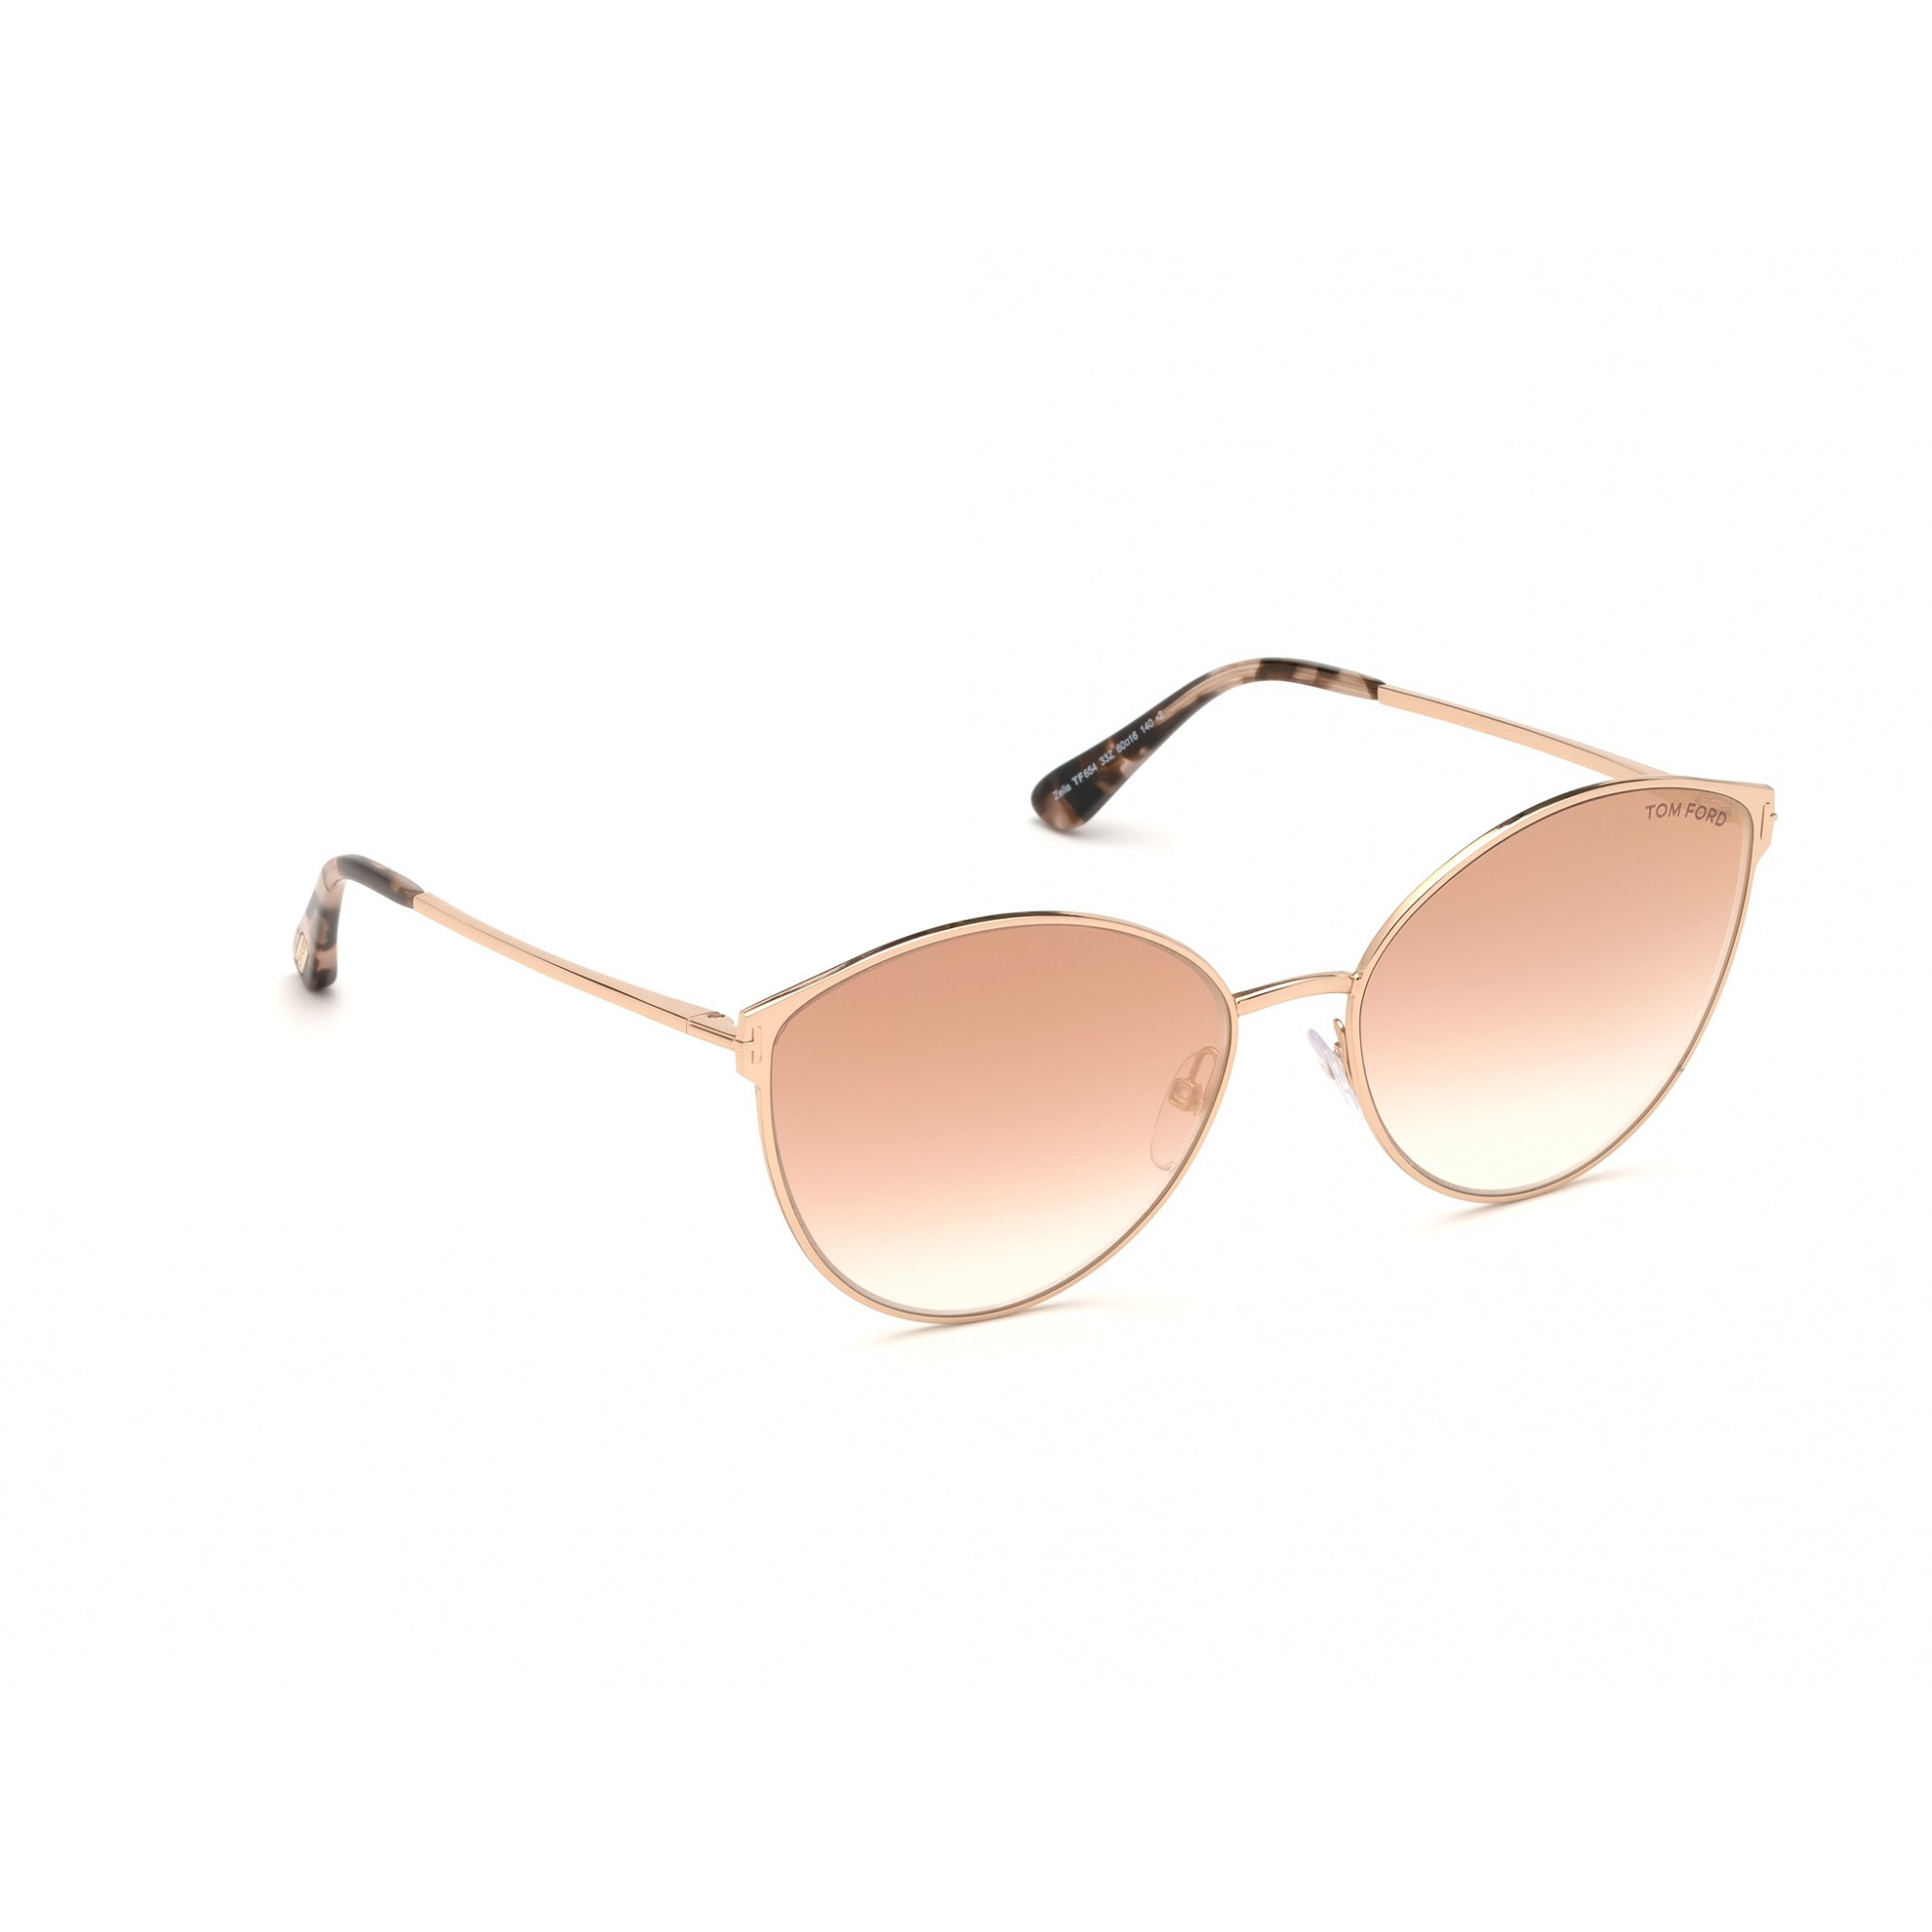 Tom Ford - FT0654 33Z - Óculos de sol